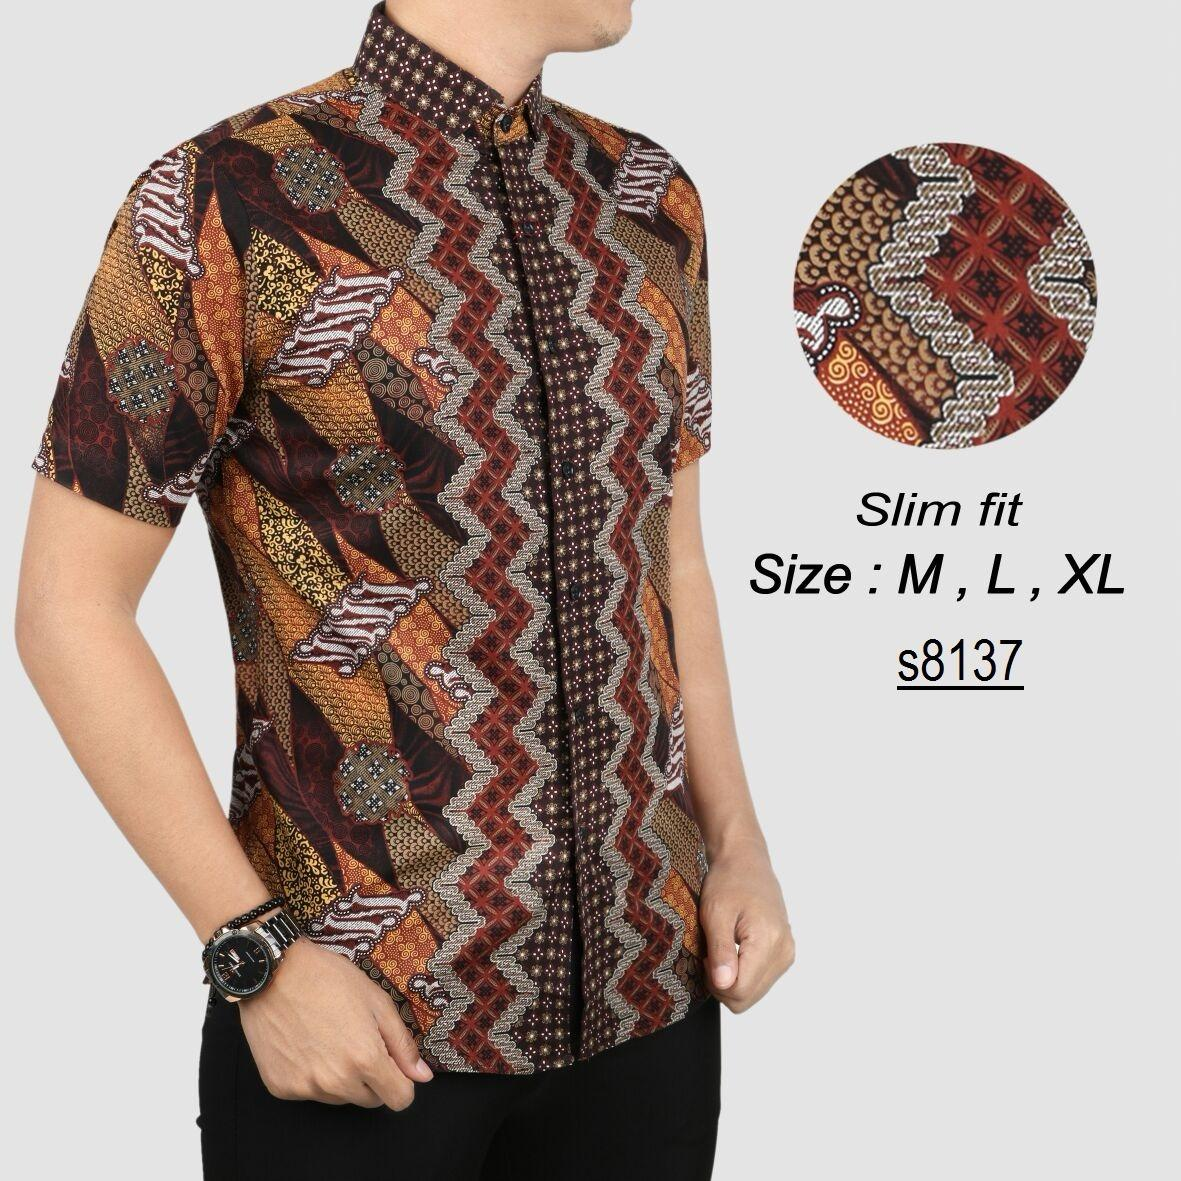 Kemeja Batik Pria Sutra: Cek Harga Baru Batik Pria Modern Kemeja Pria Slim Fit 9305